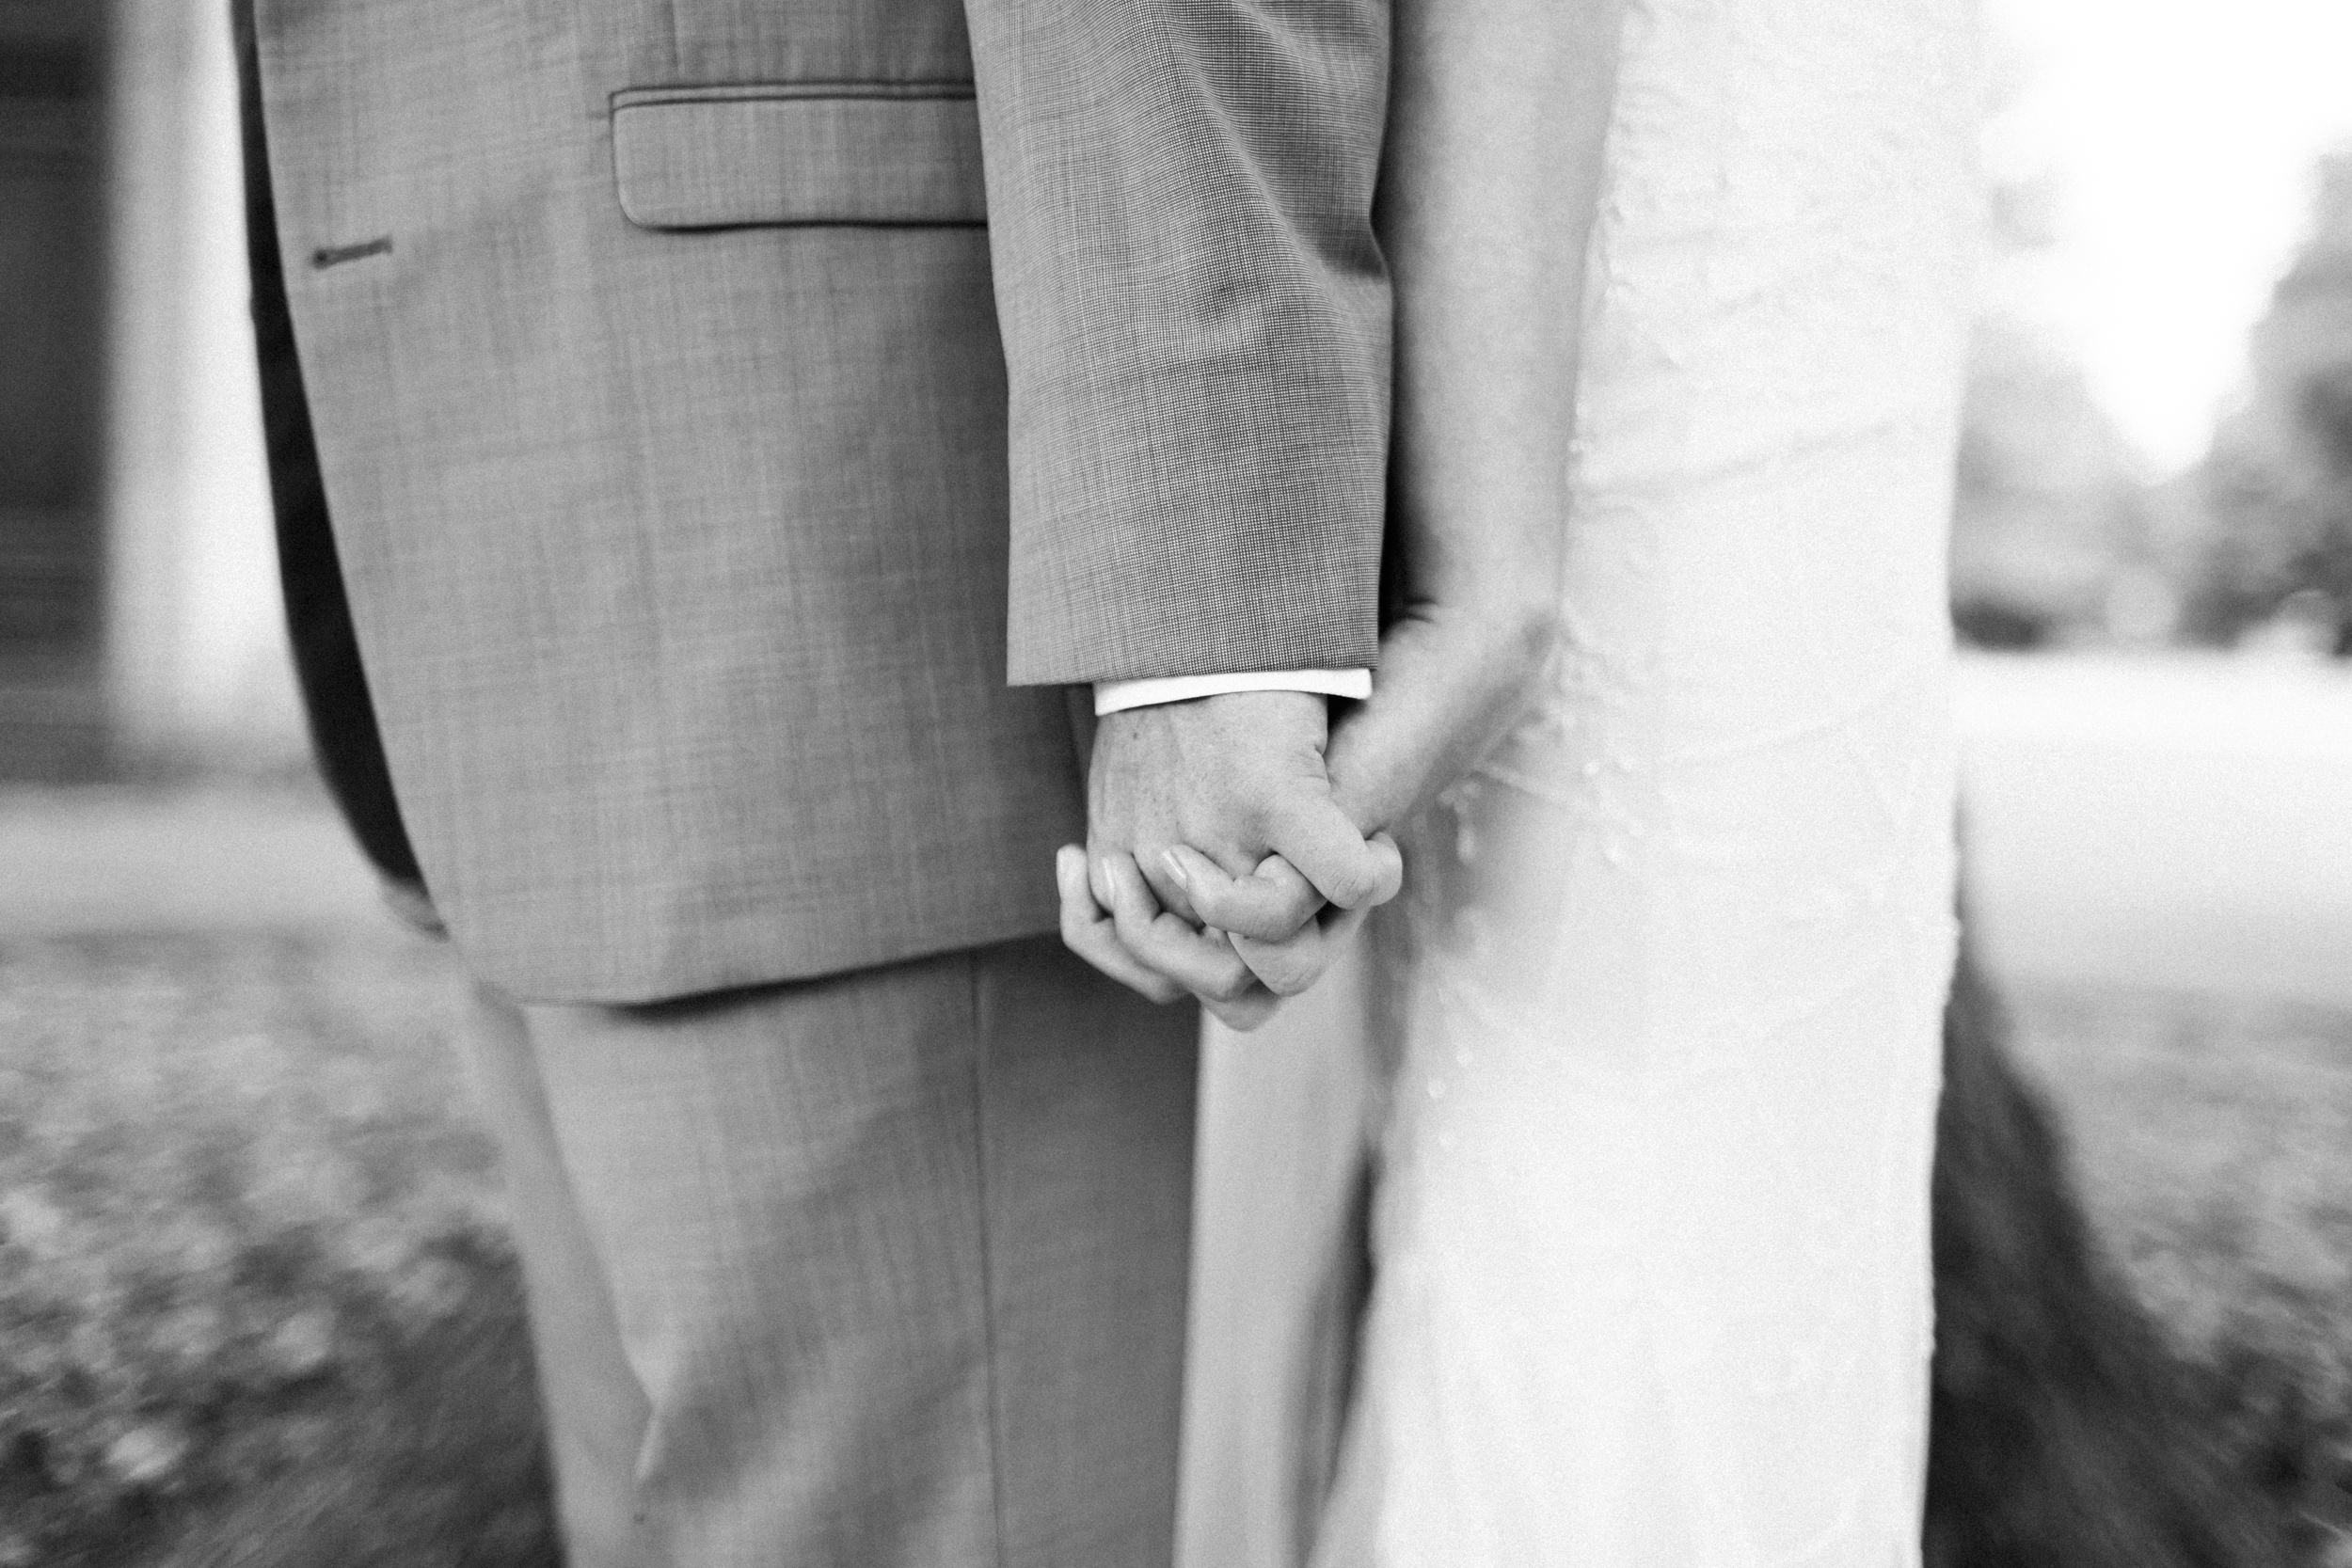 calebclairewedding-35.jpg